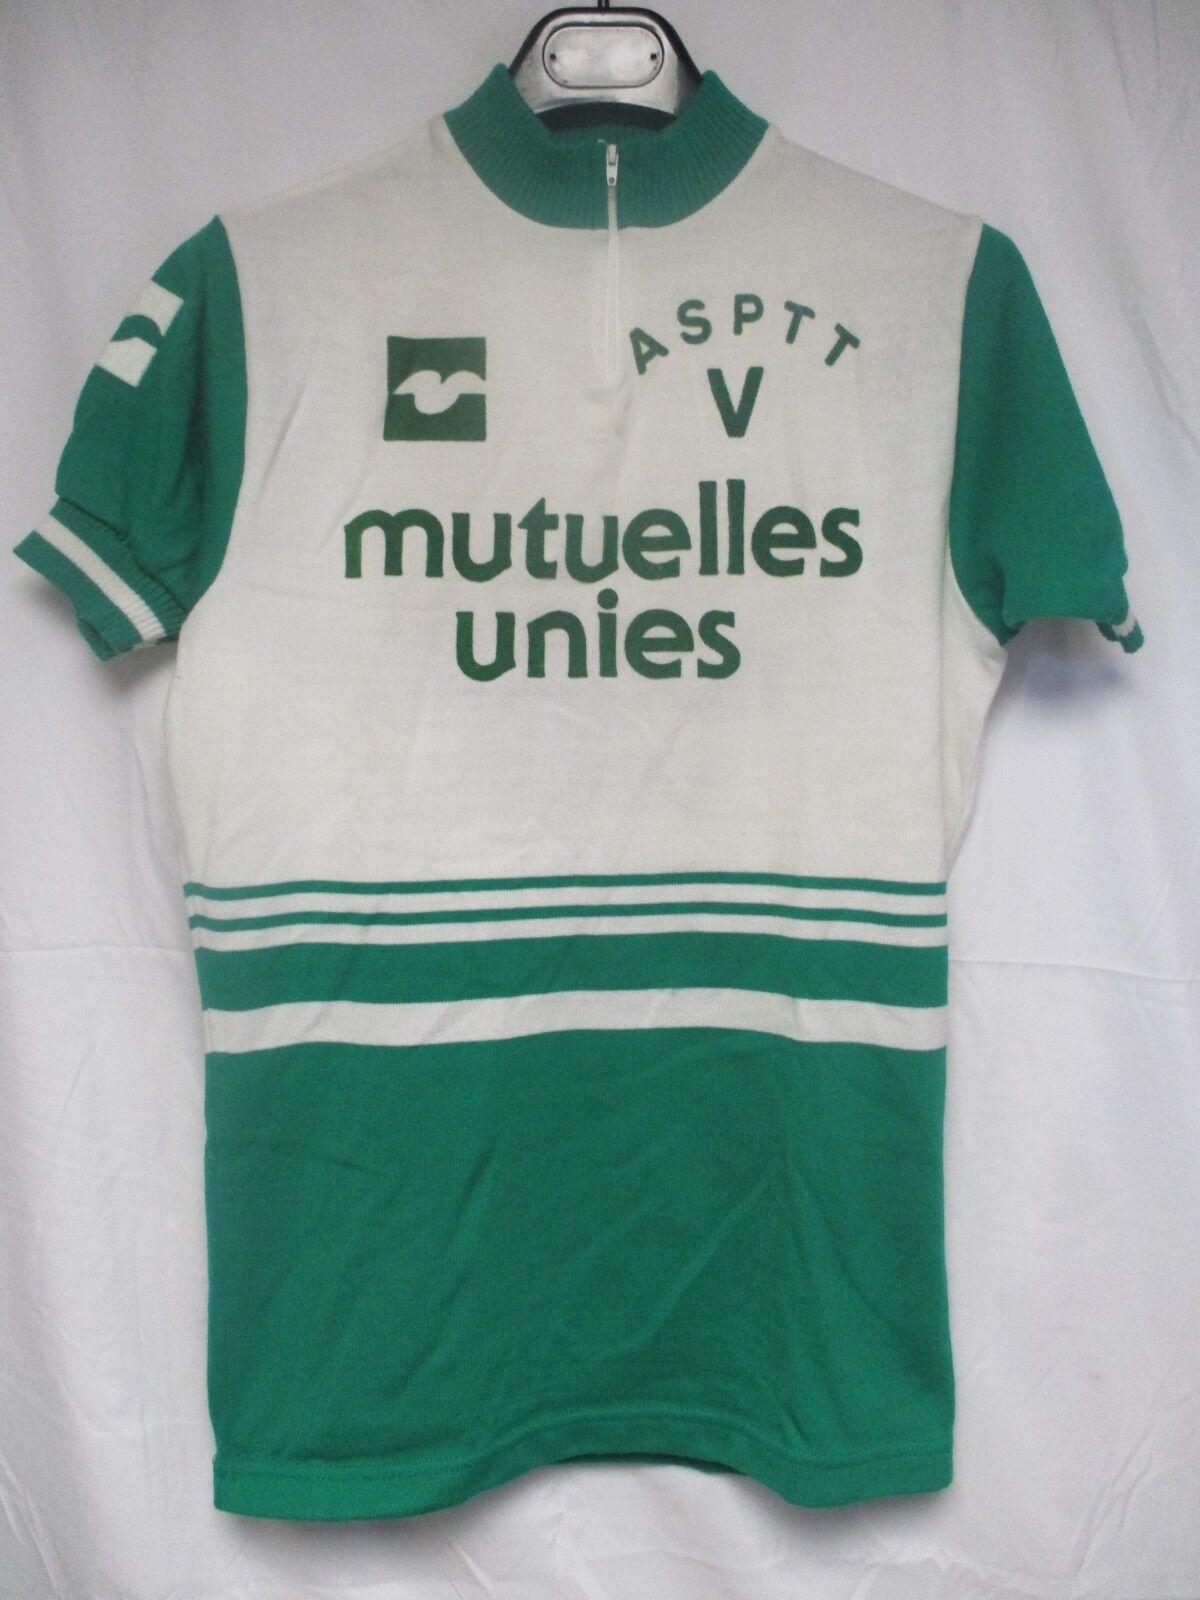 Maillot cycliste vintage ASPTT MUTUELLES UNIES shirt jersey trikot maglia 70's M